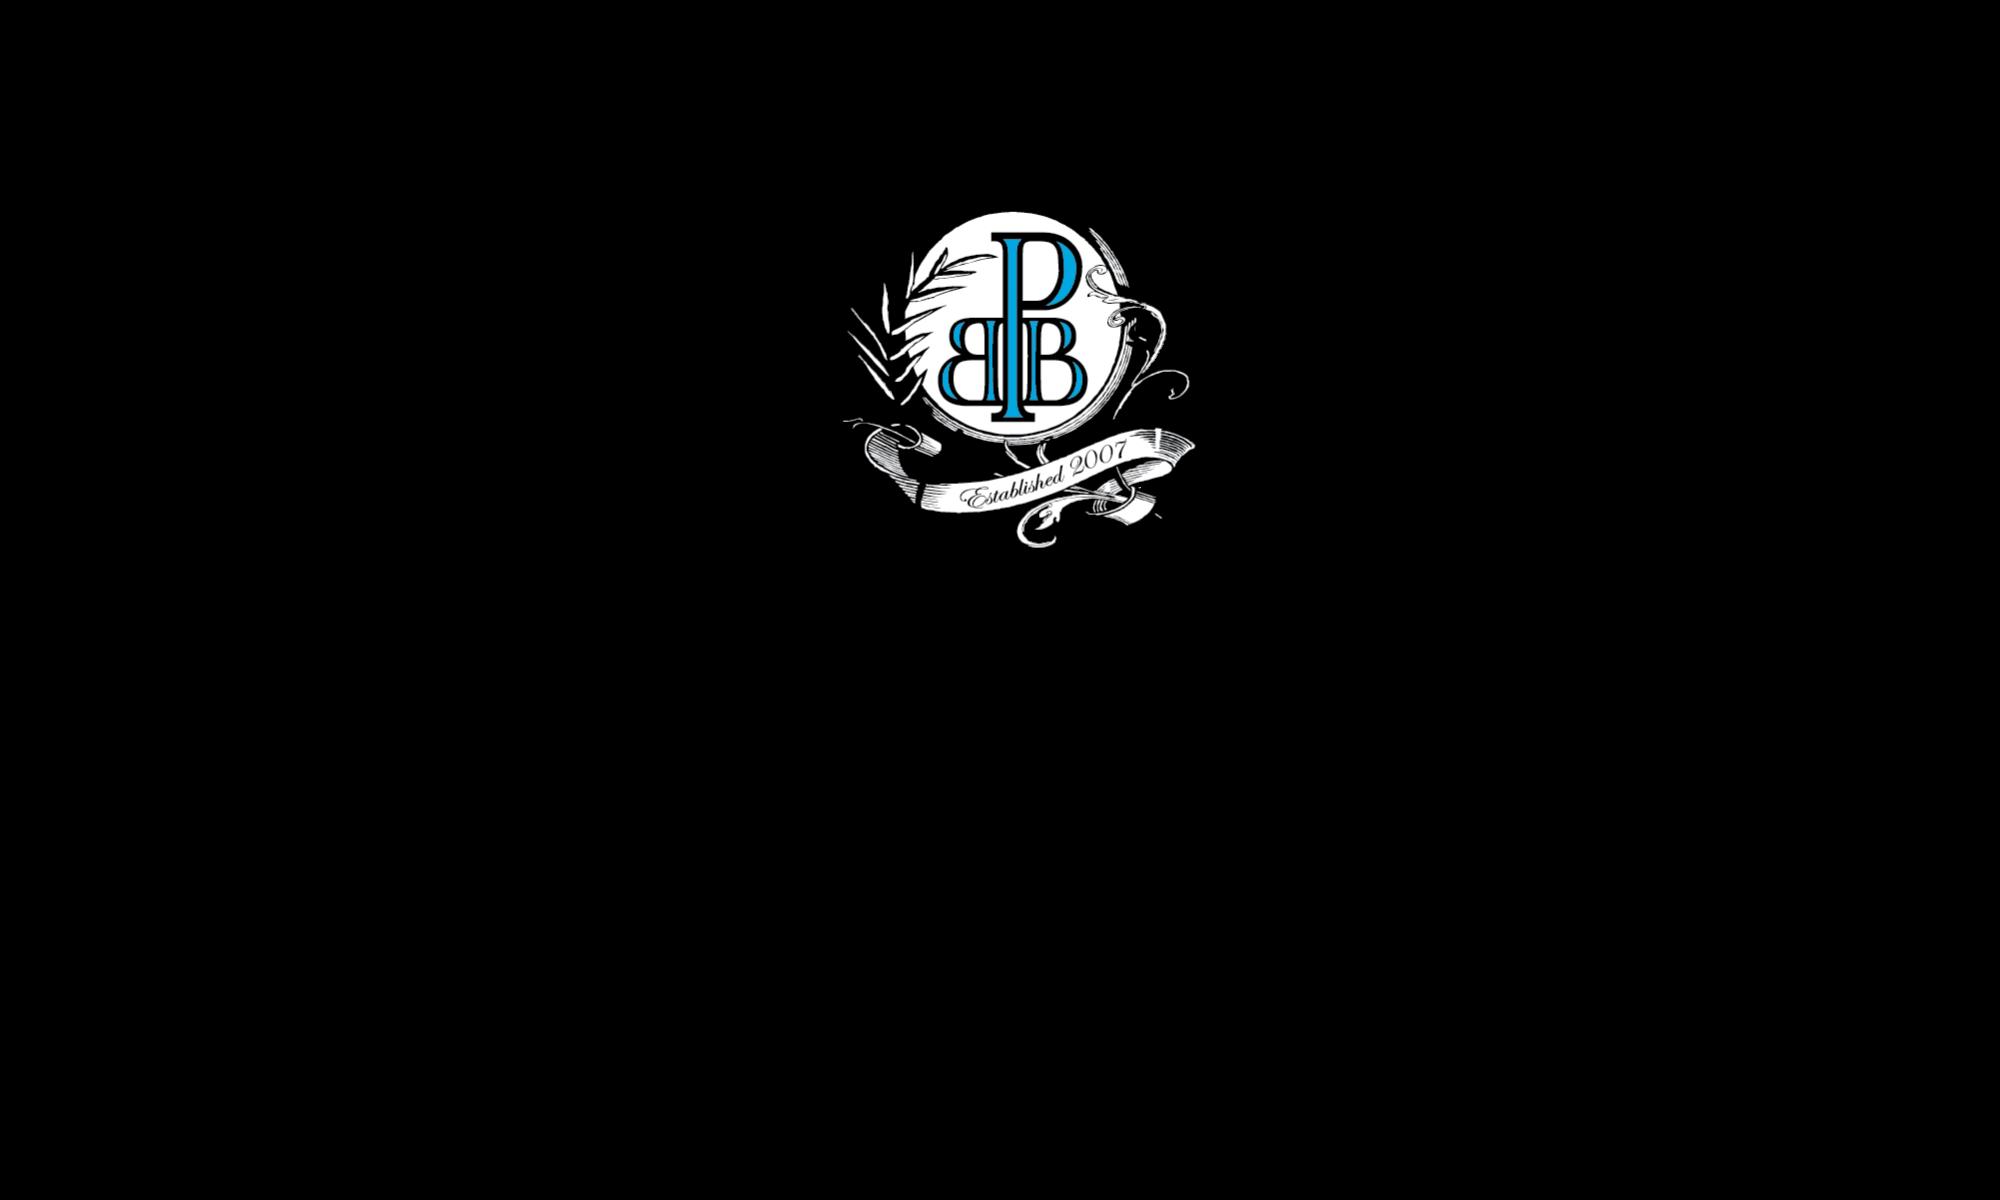 Philadelphia Brewers & Bottlers